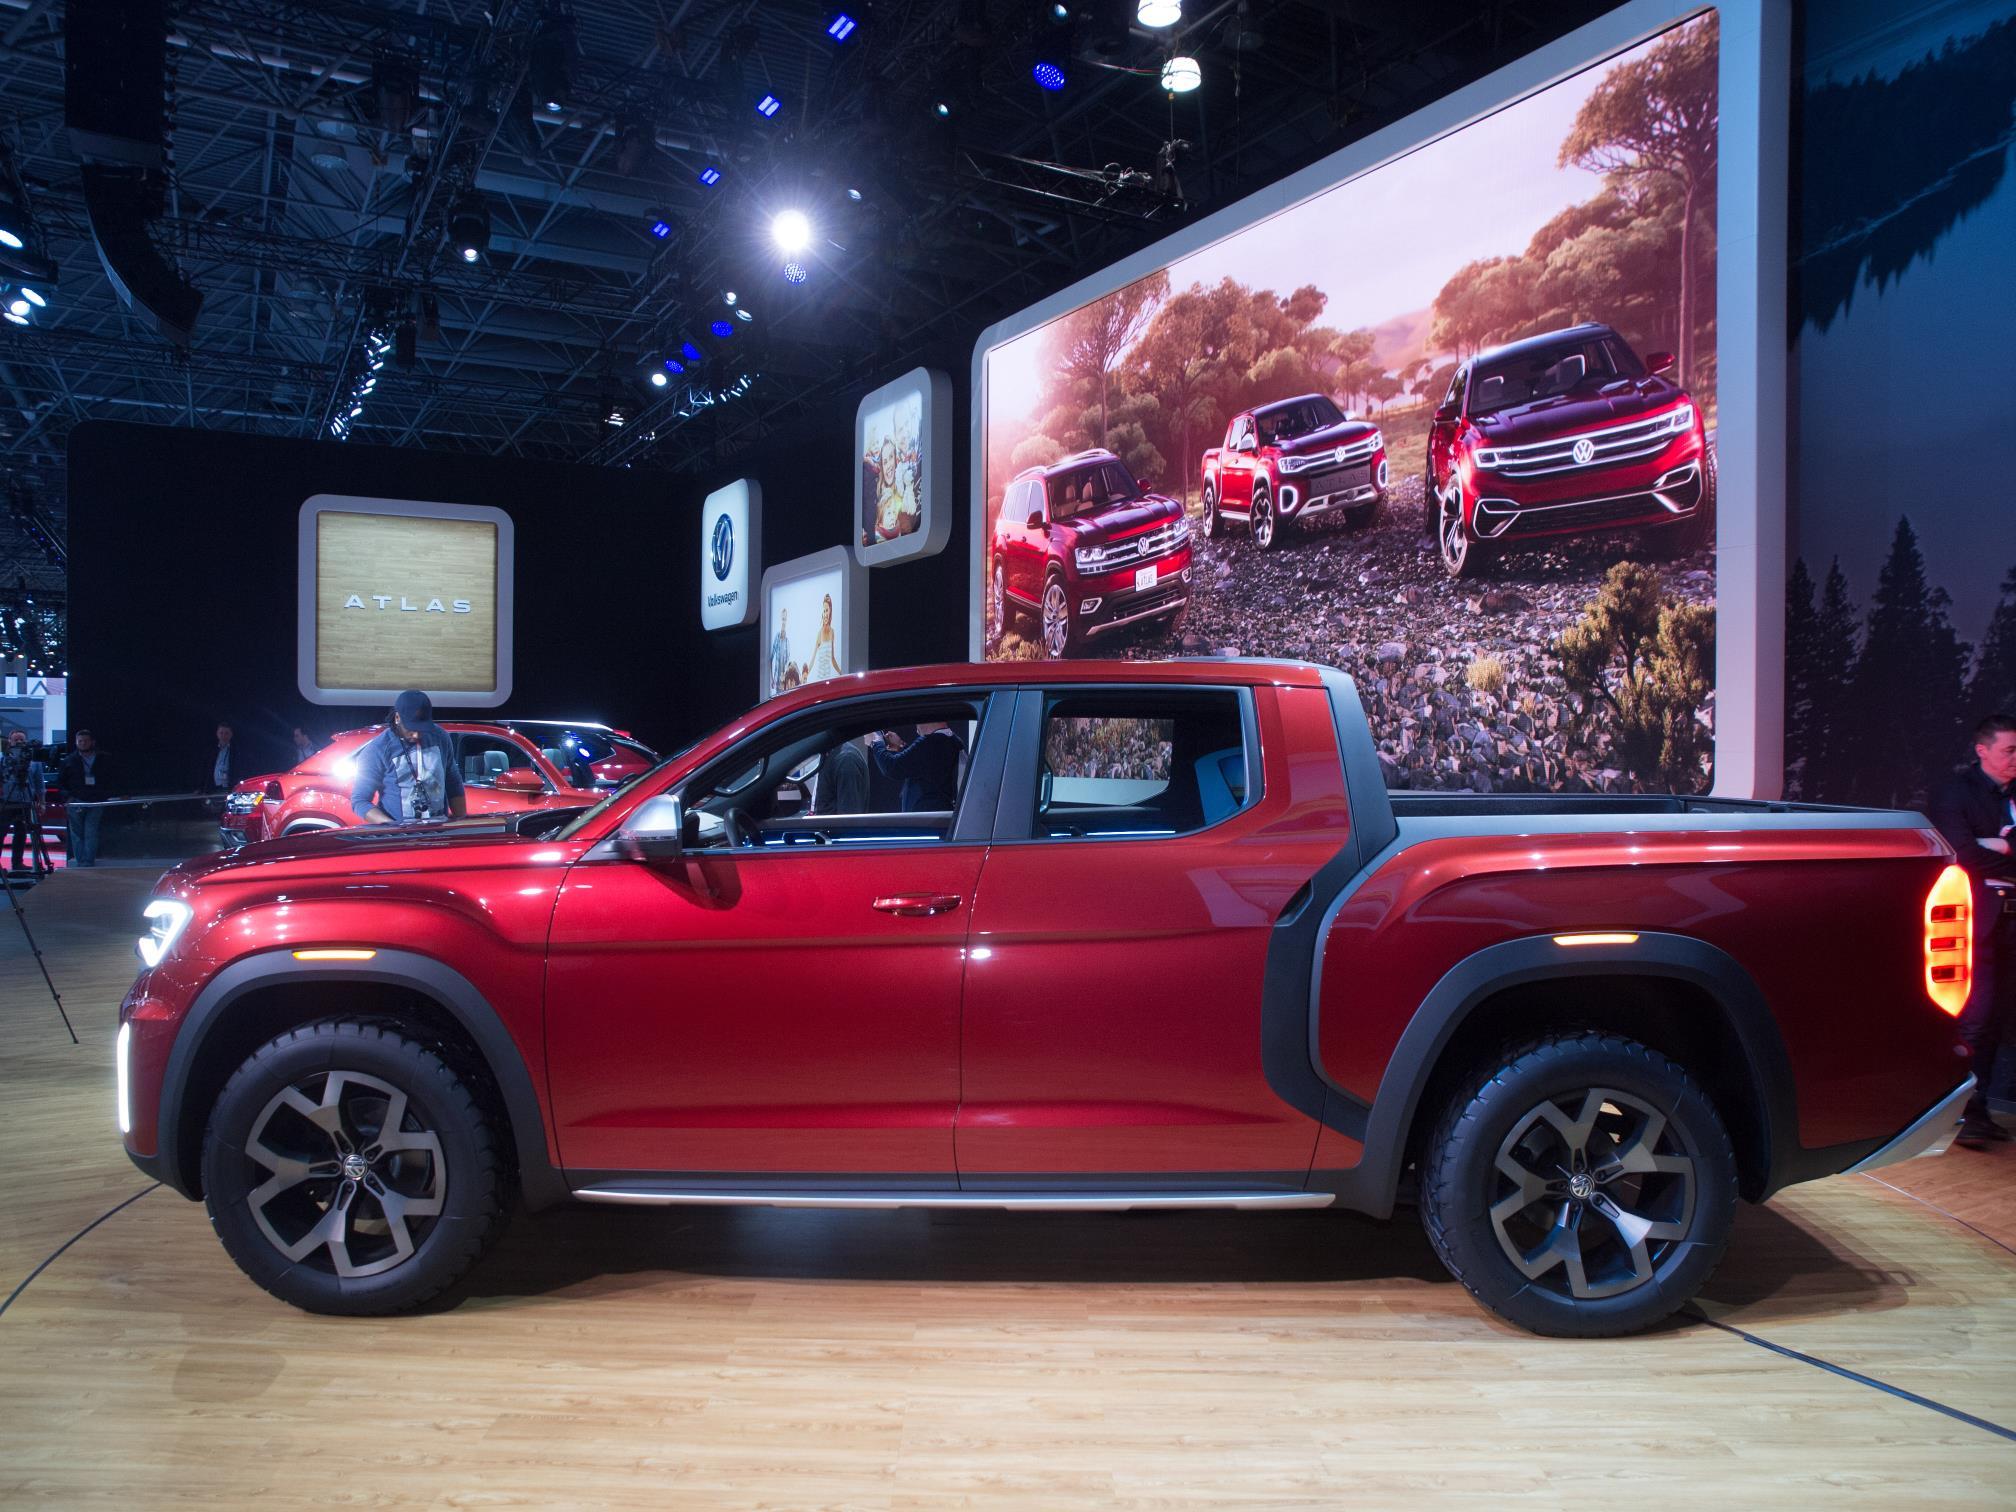 Volkswagen Atlas Tanoak Pickup Shows Cool Design Details, Evolutionary Interior - autoevolution